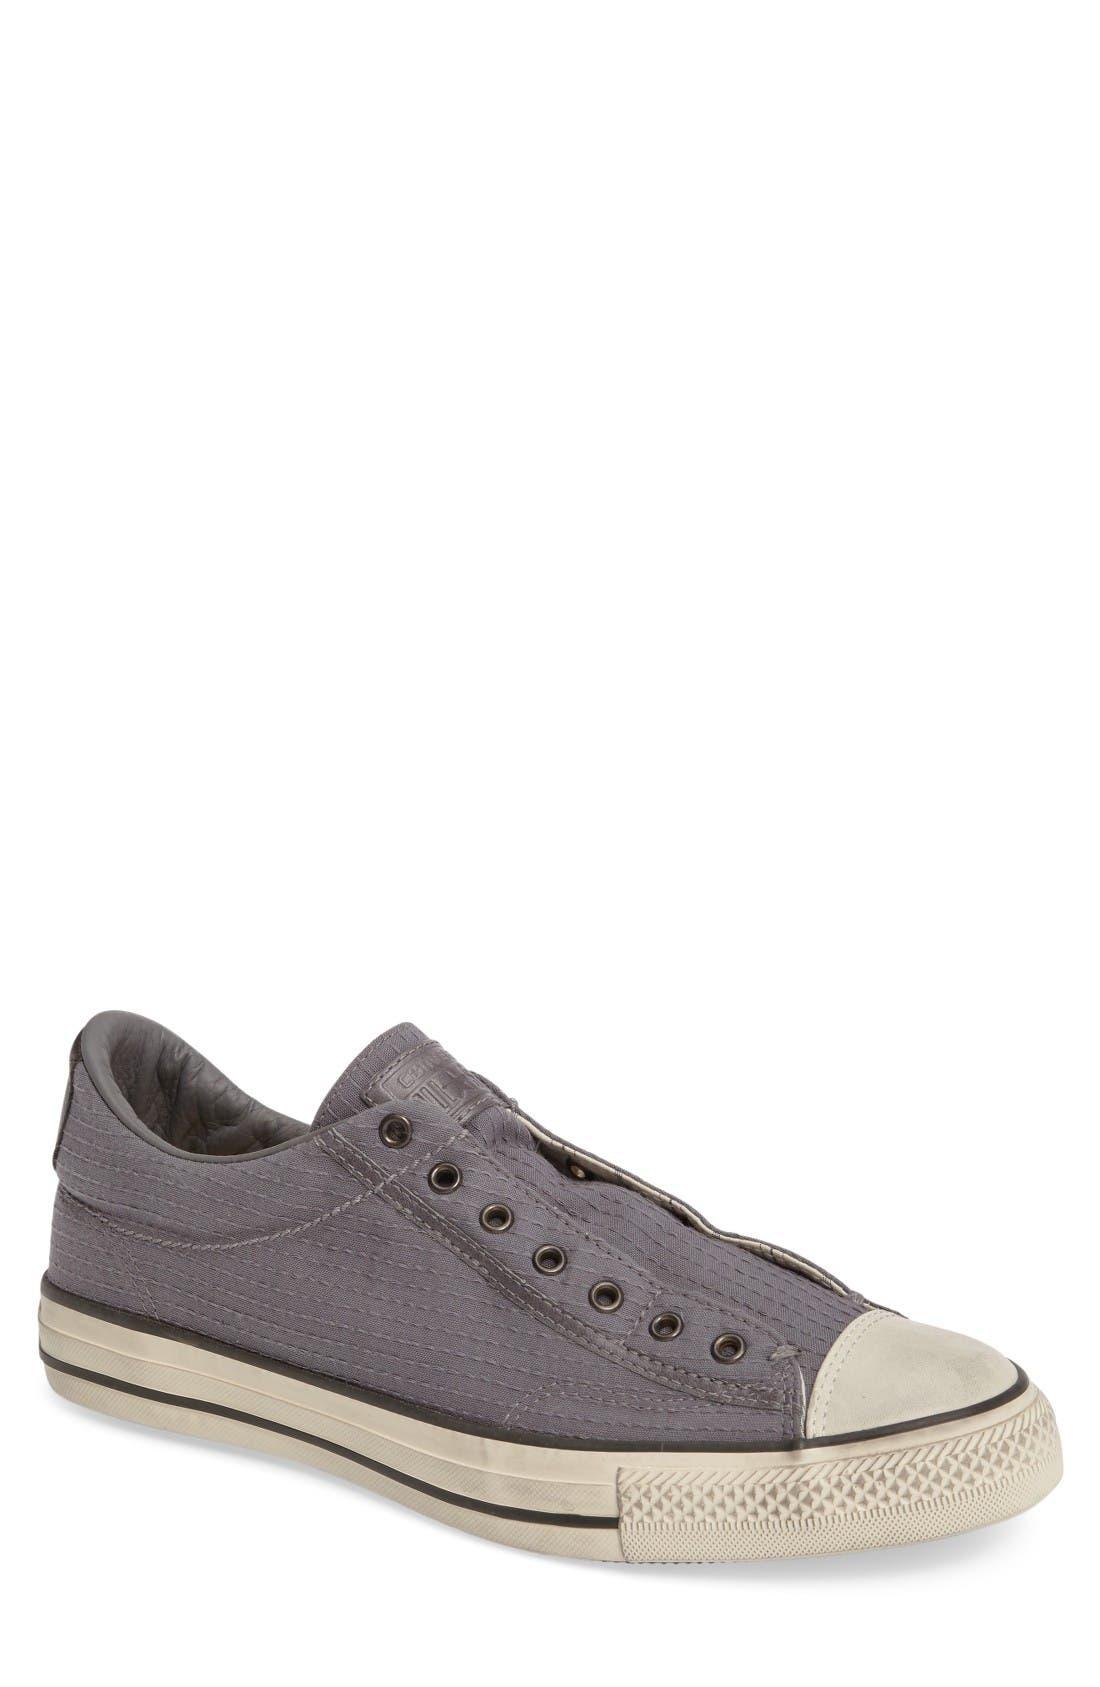 Main Image - Converse by John Varvatos Chuck Taylor® All Star® Slip-On Sneaker (Men)